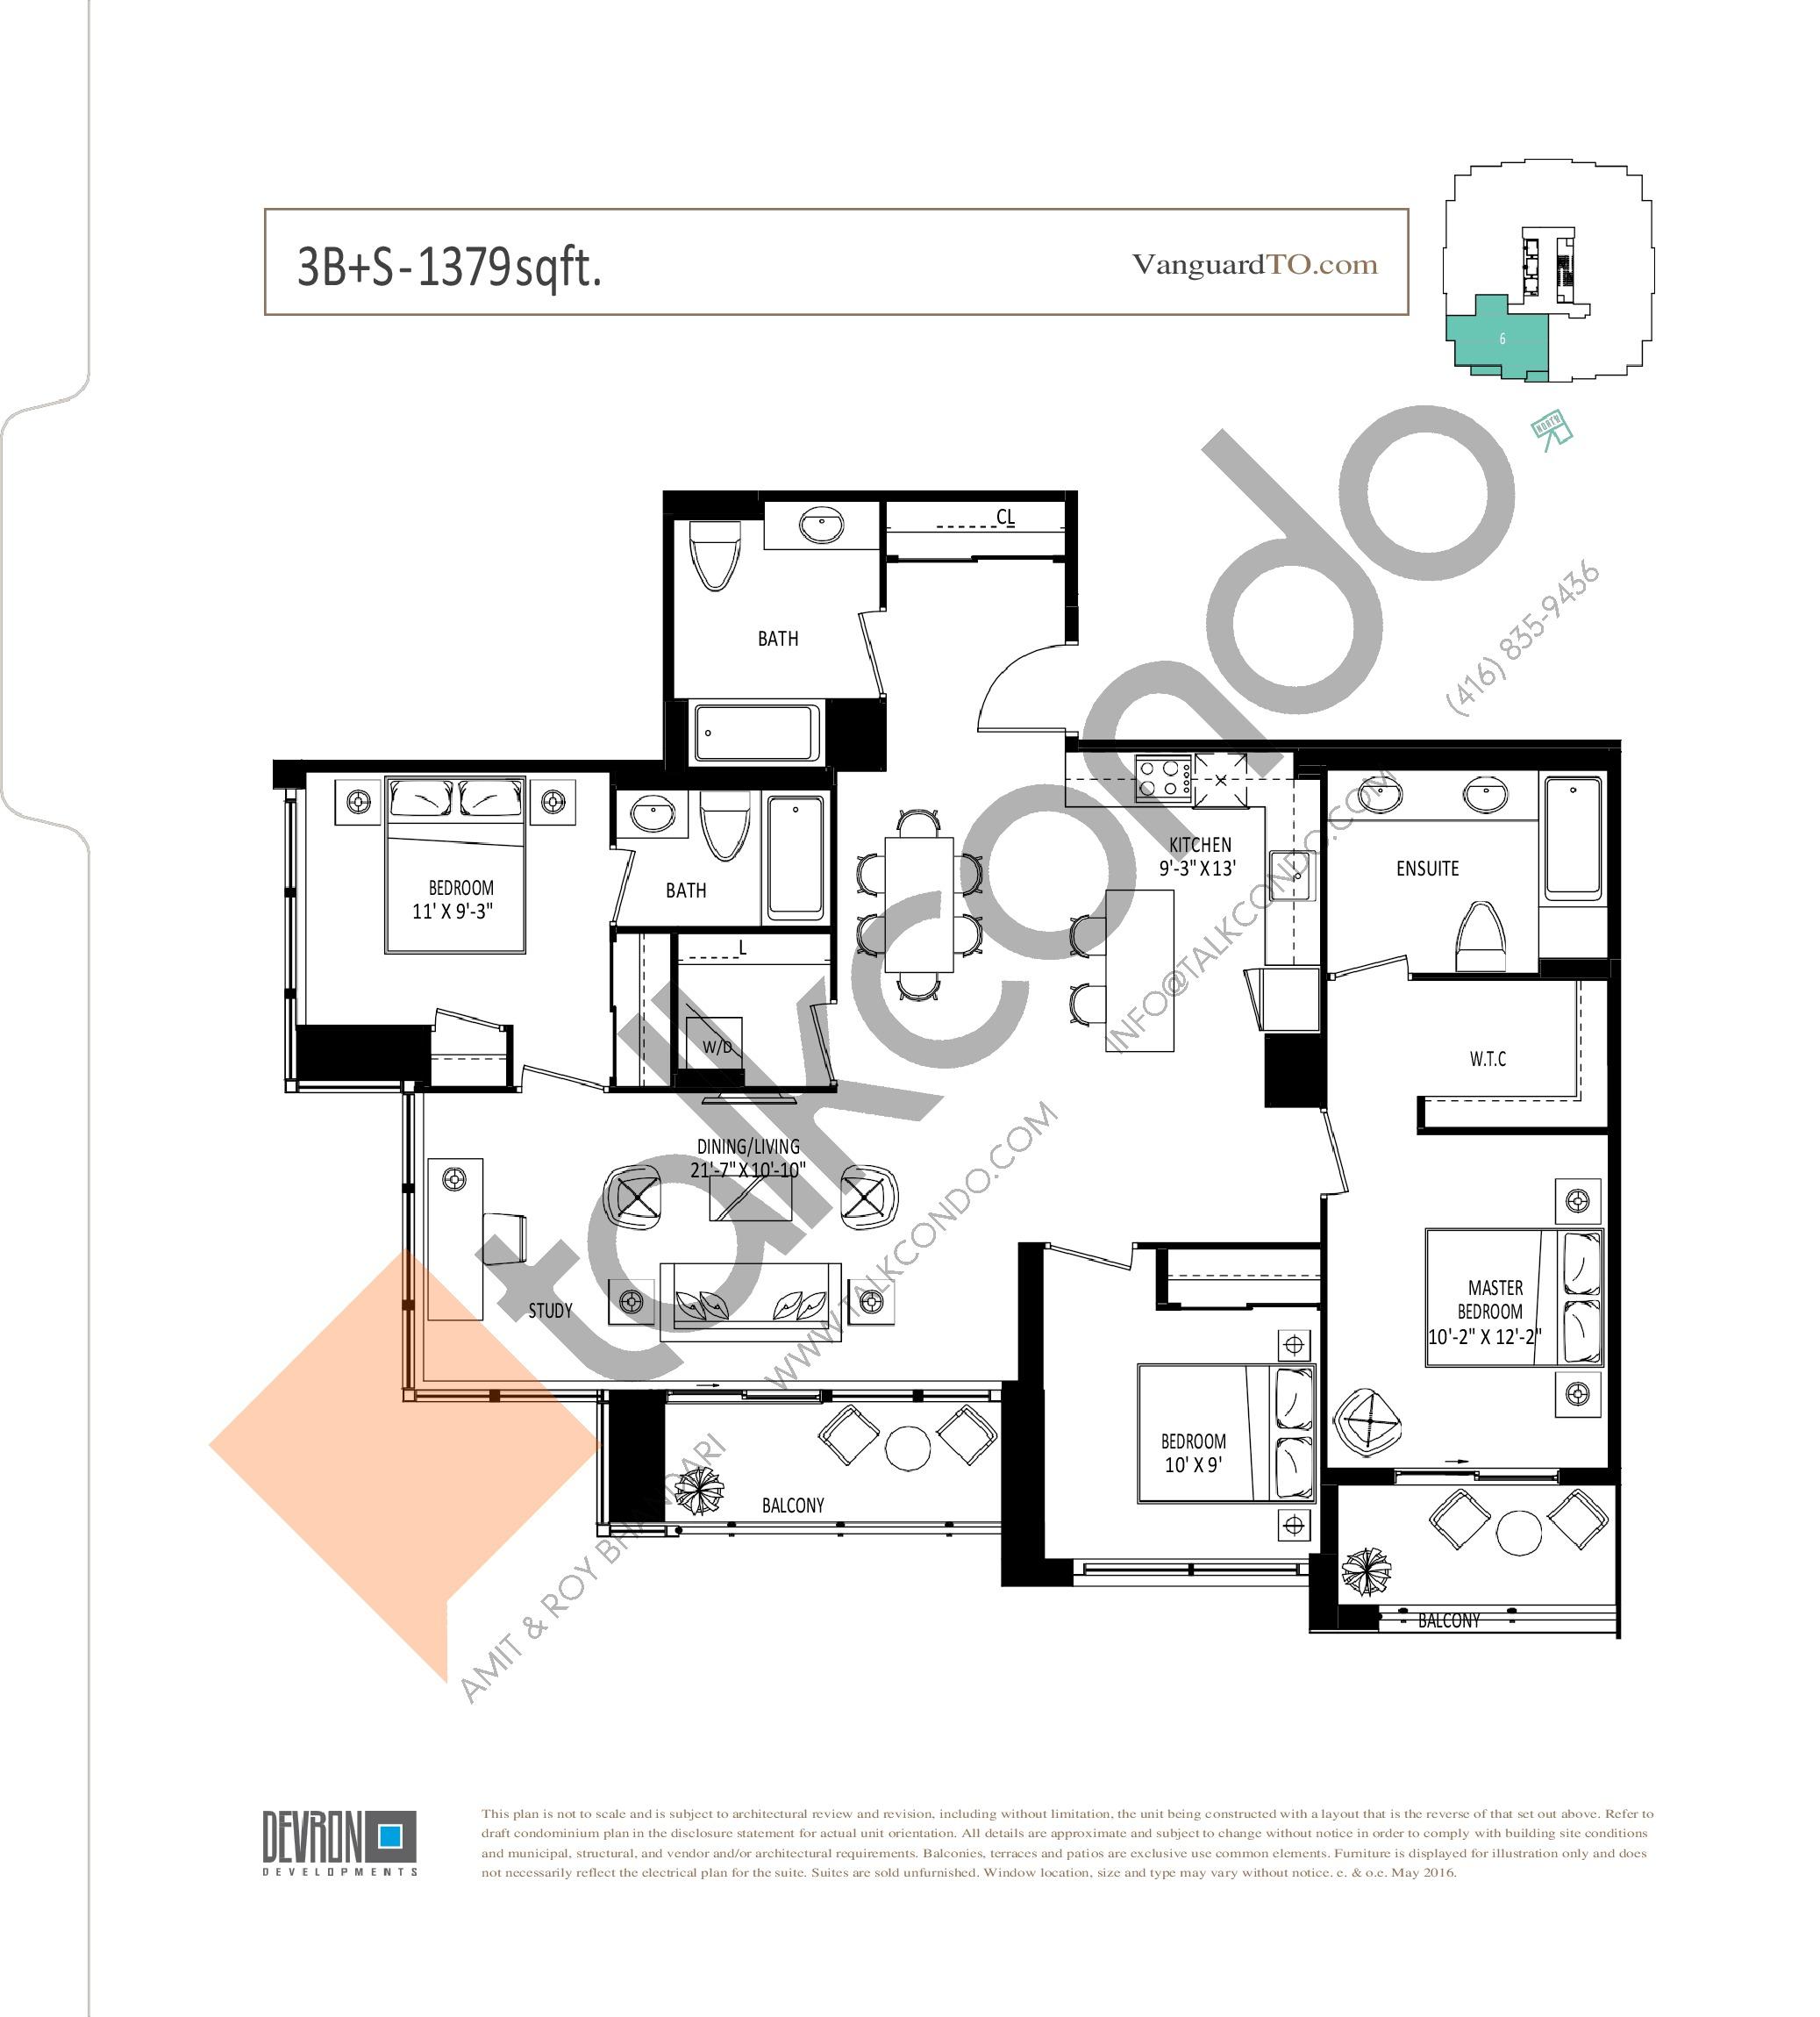 3B+S Floor Plan at The Vanguard - 1379 sq.ft